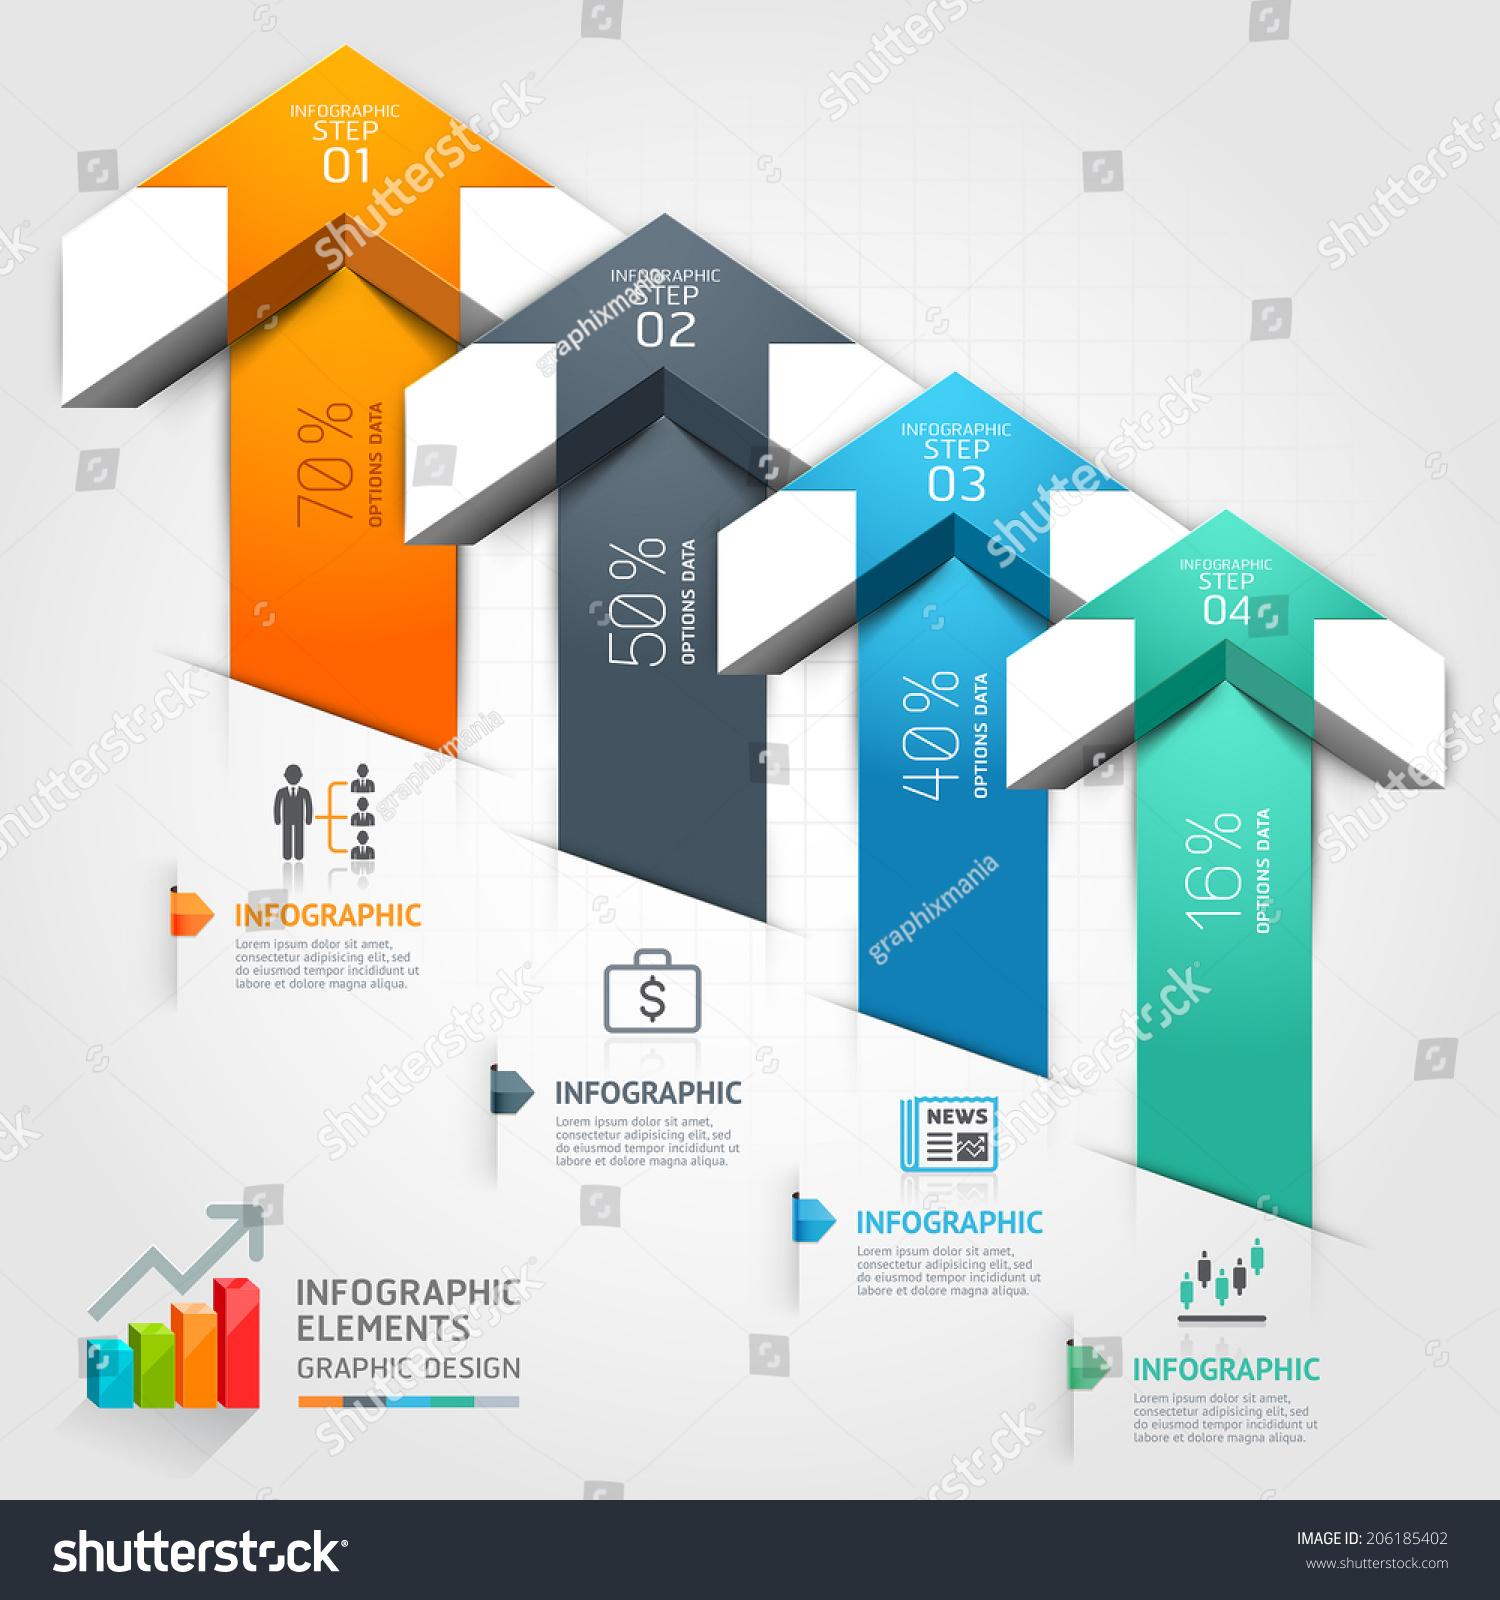 3 D Step Arrow Staircase Diagram Business Stock Vector 206185402 ...